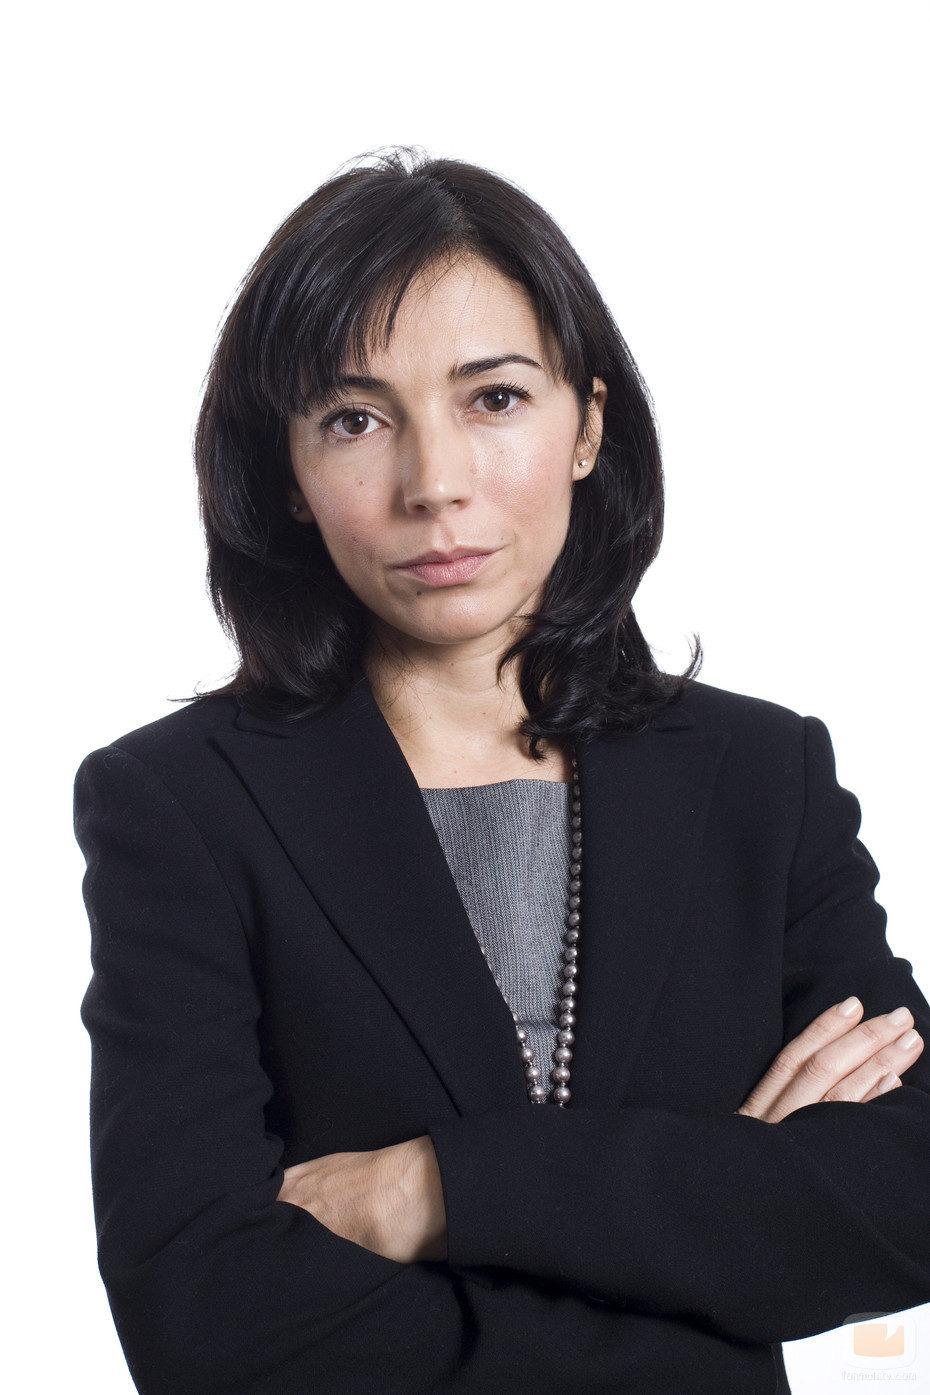 Silvia Sanz García